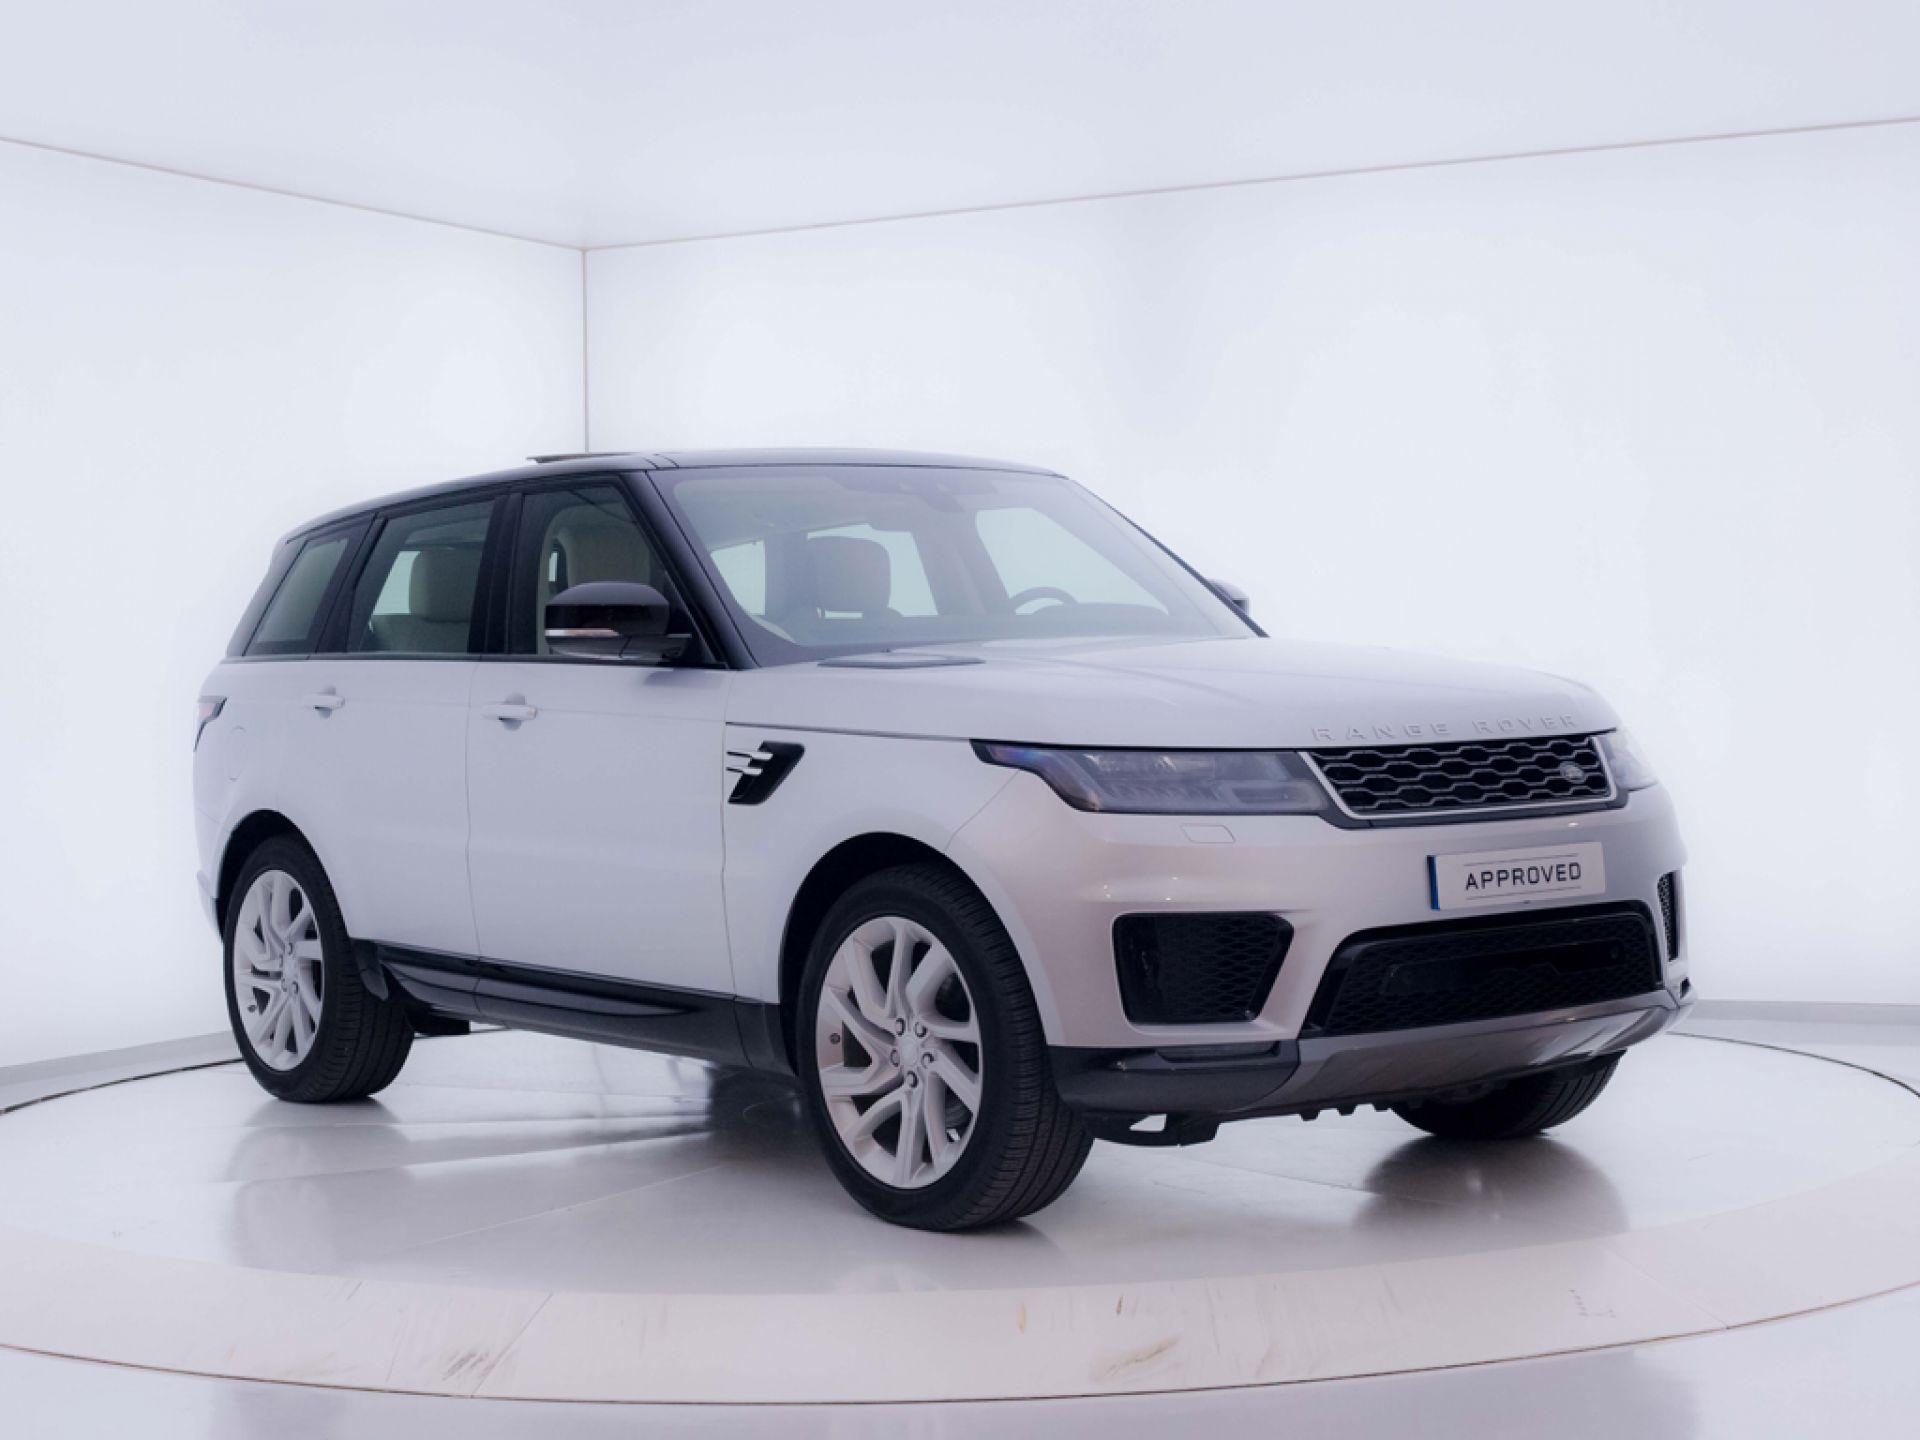 Land Rover Range Rover Sport 2.0 Si4 221kW (300CV) HSE